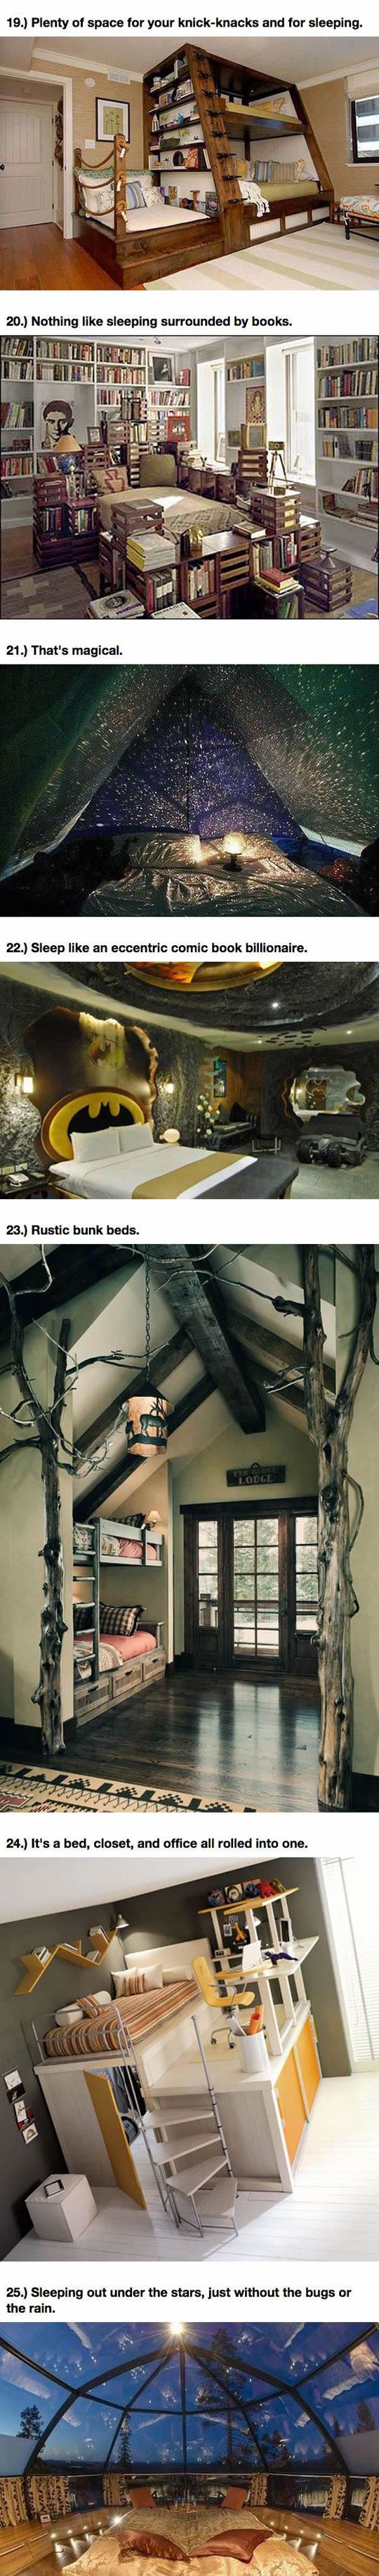 Best bed designs ever